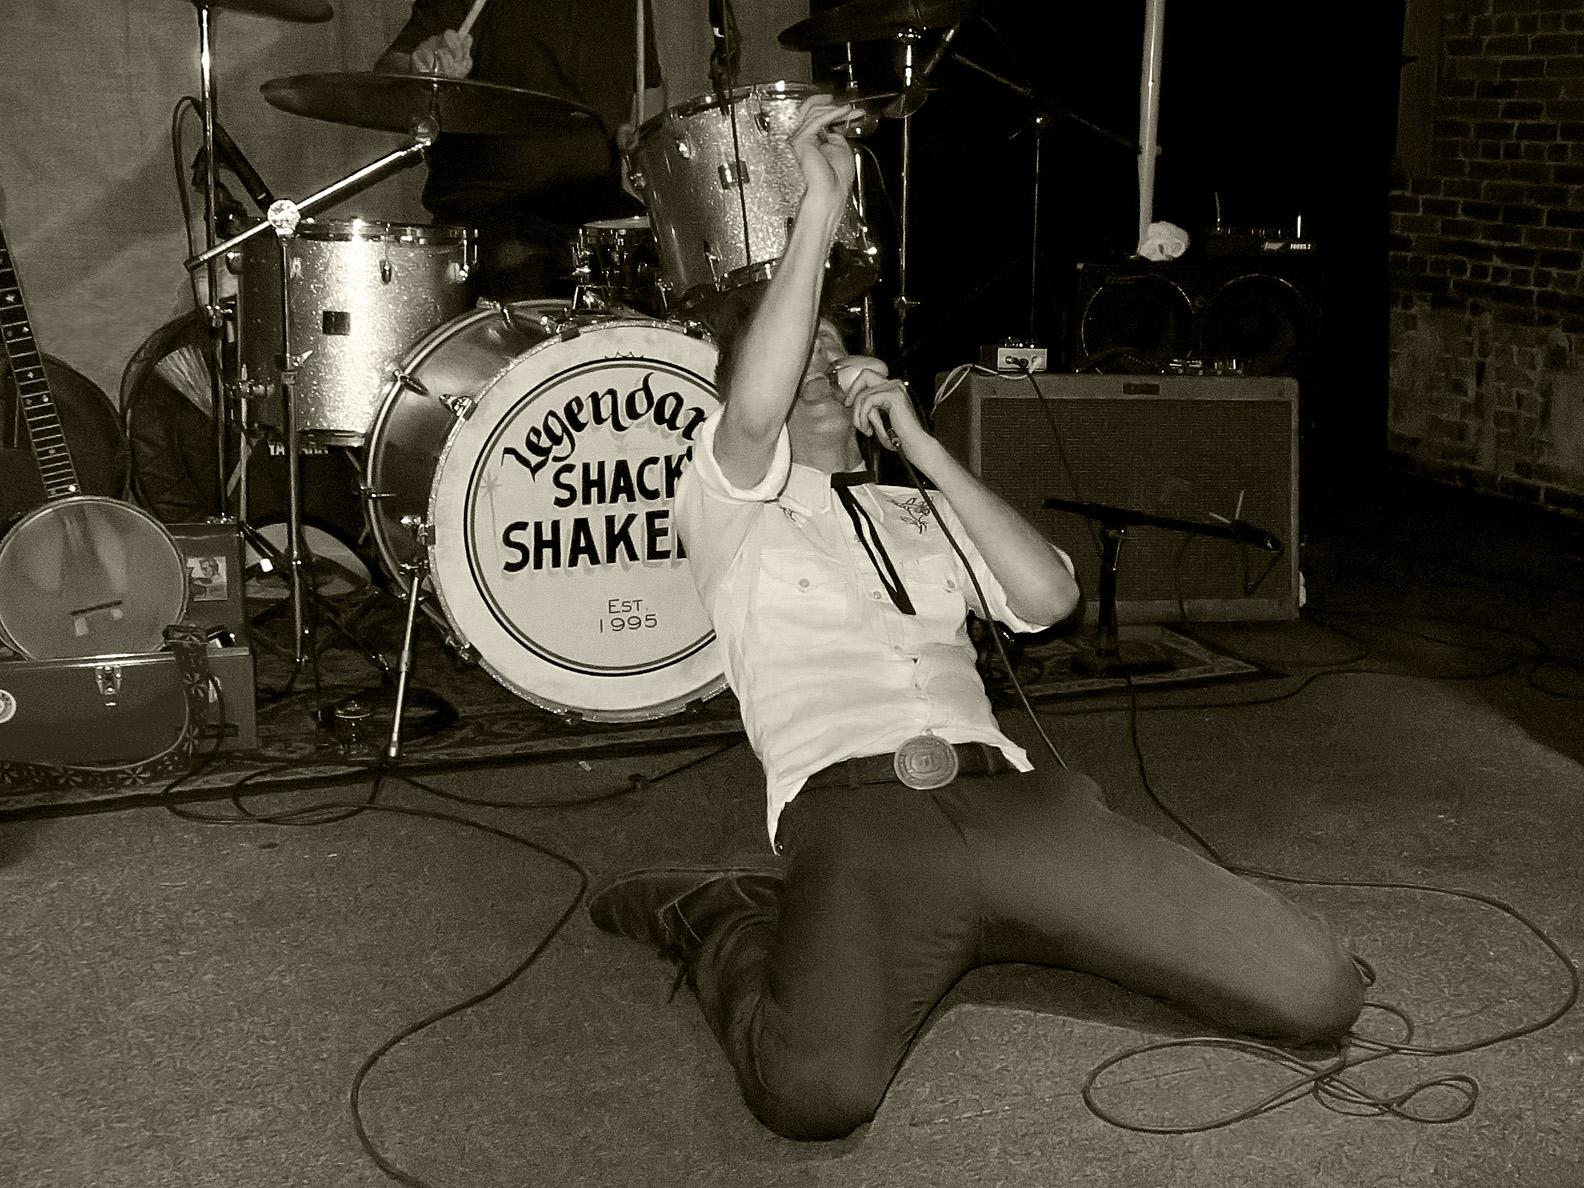 Th_Legendary_Shack_Shakers01